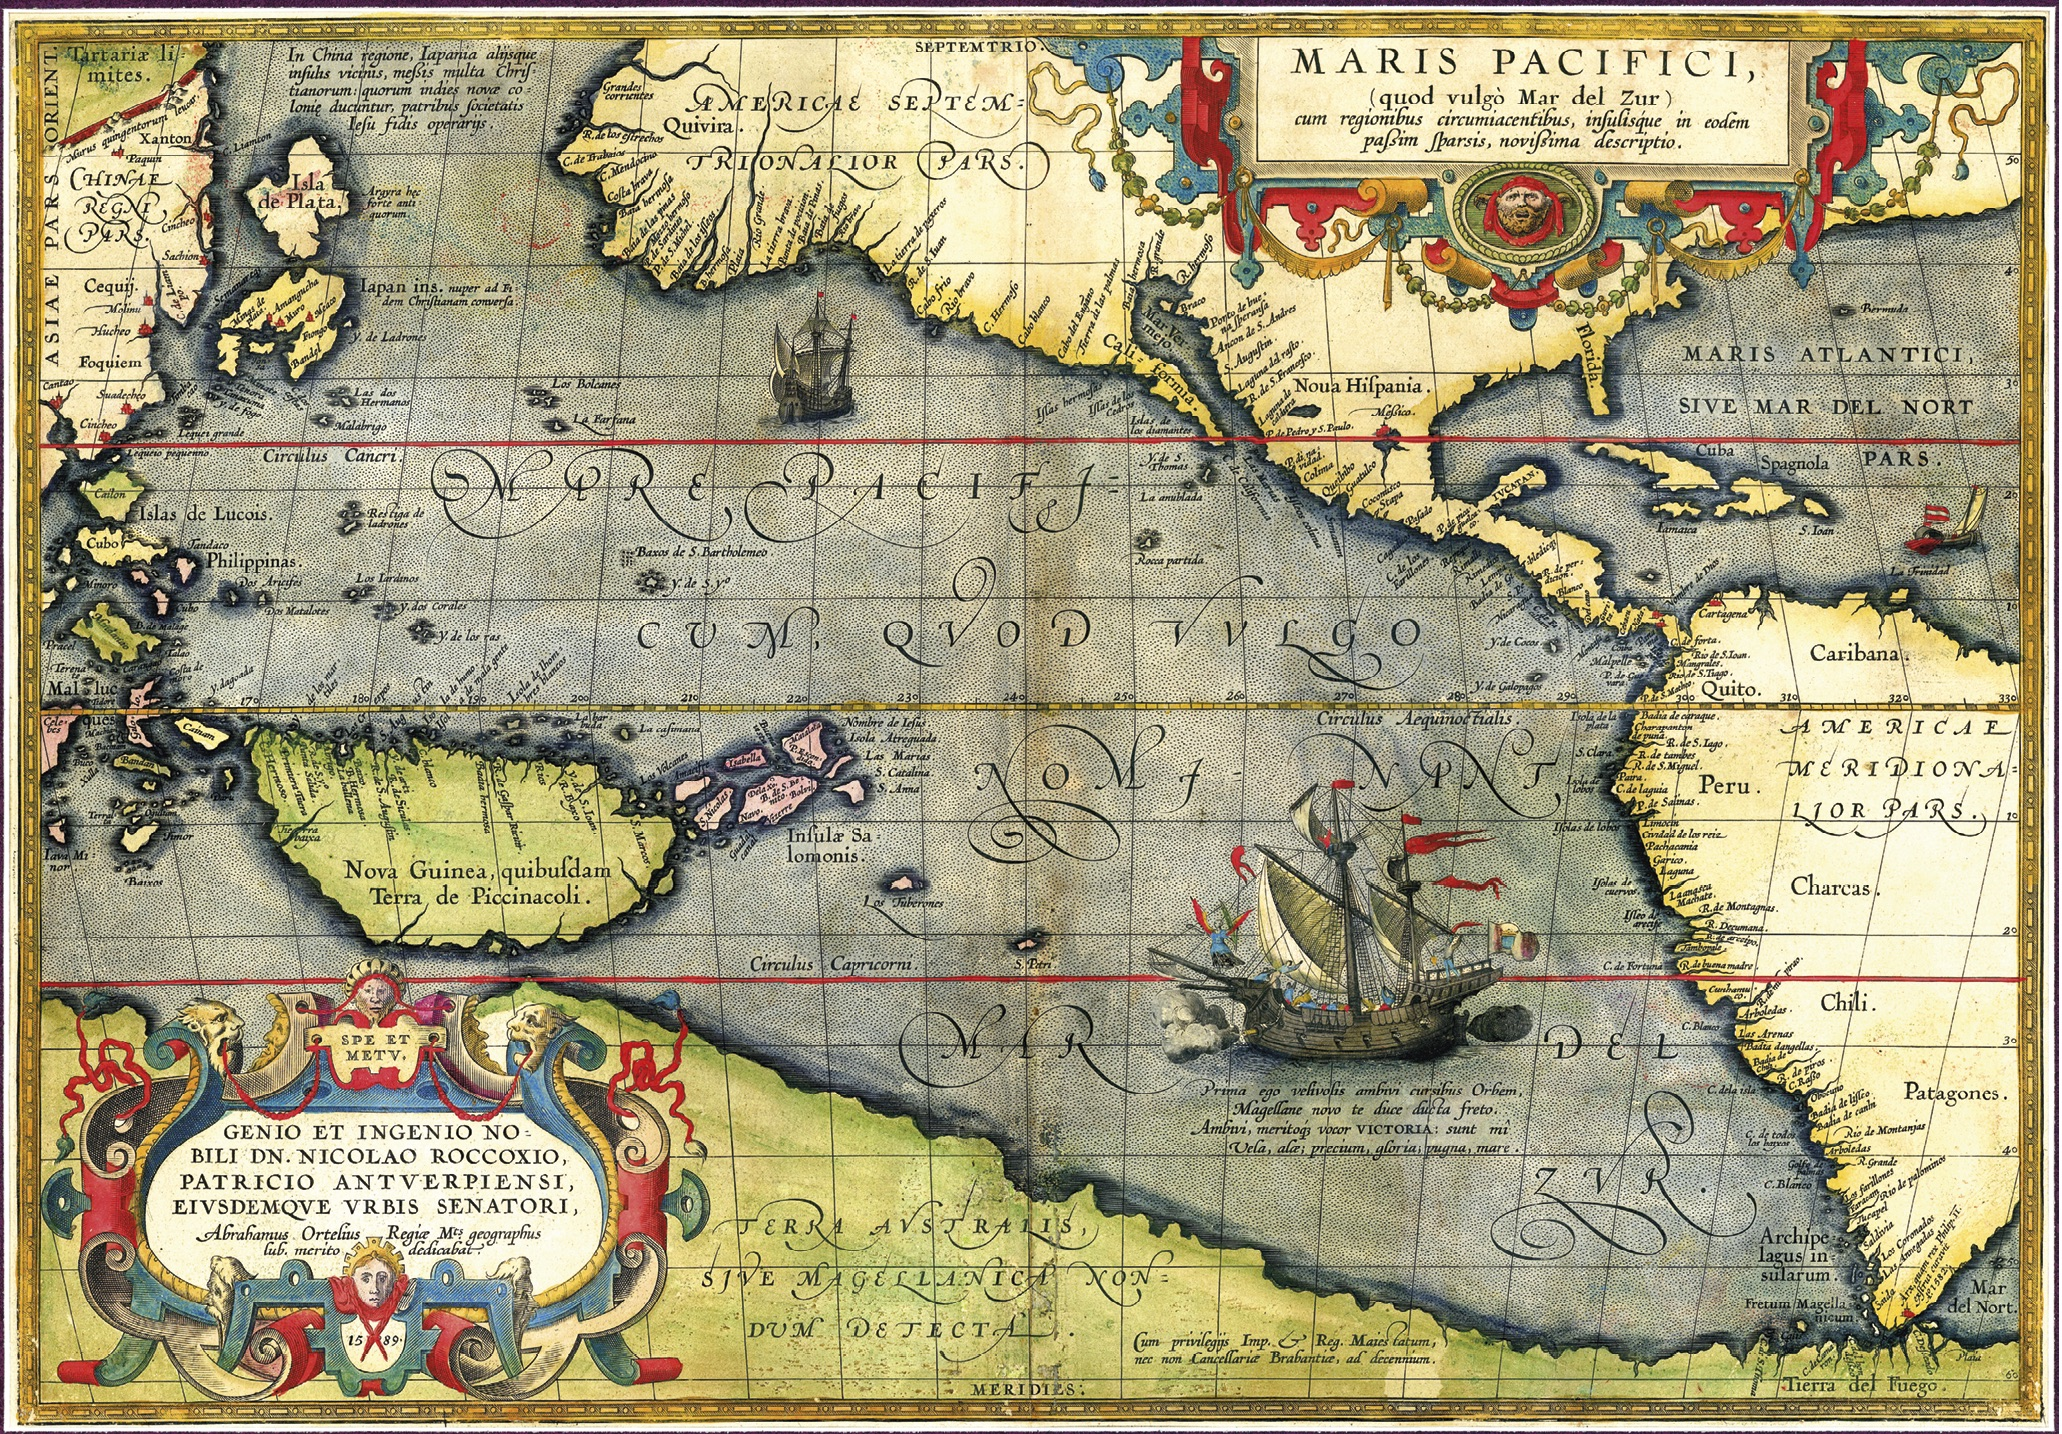 Mapa do oceano Pacífico, de Abraham Ortelius, 1589